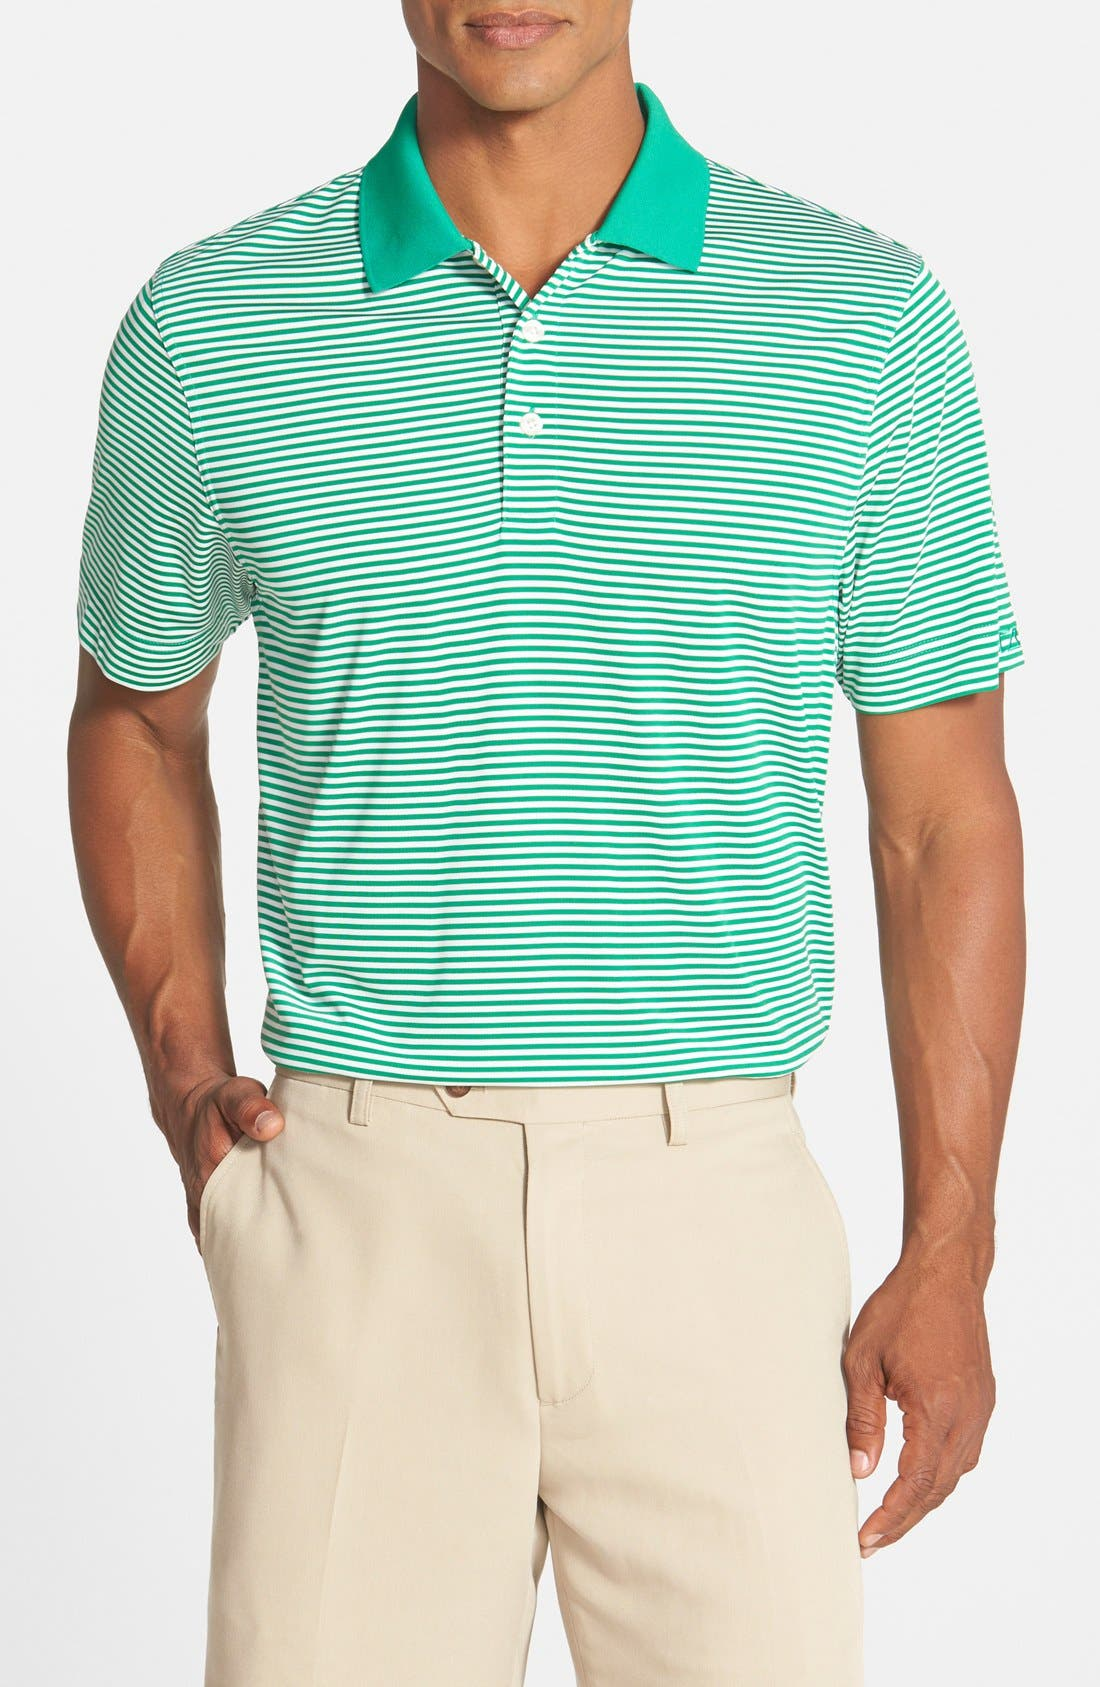 Main Image - Cutter & Buck Trevor DryTec Moisture Wicking Golf Polo